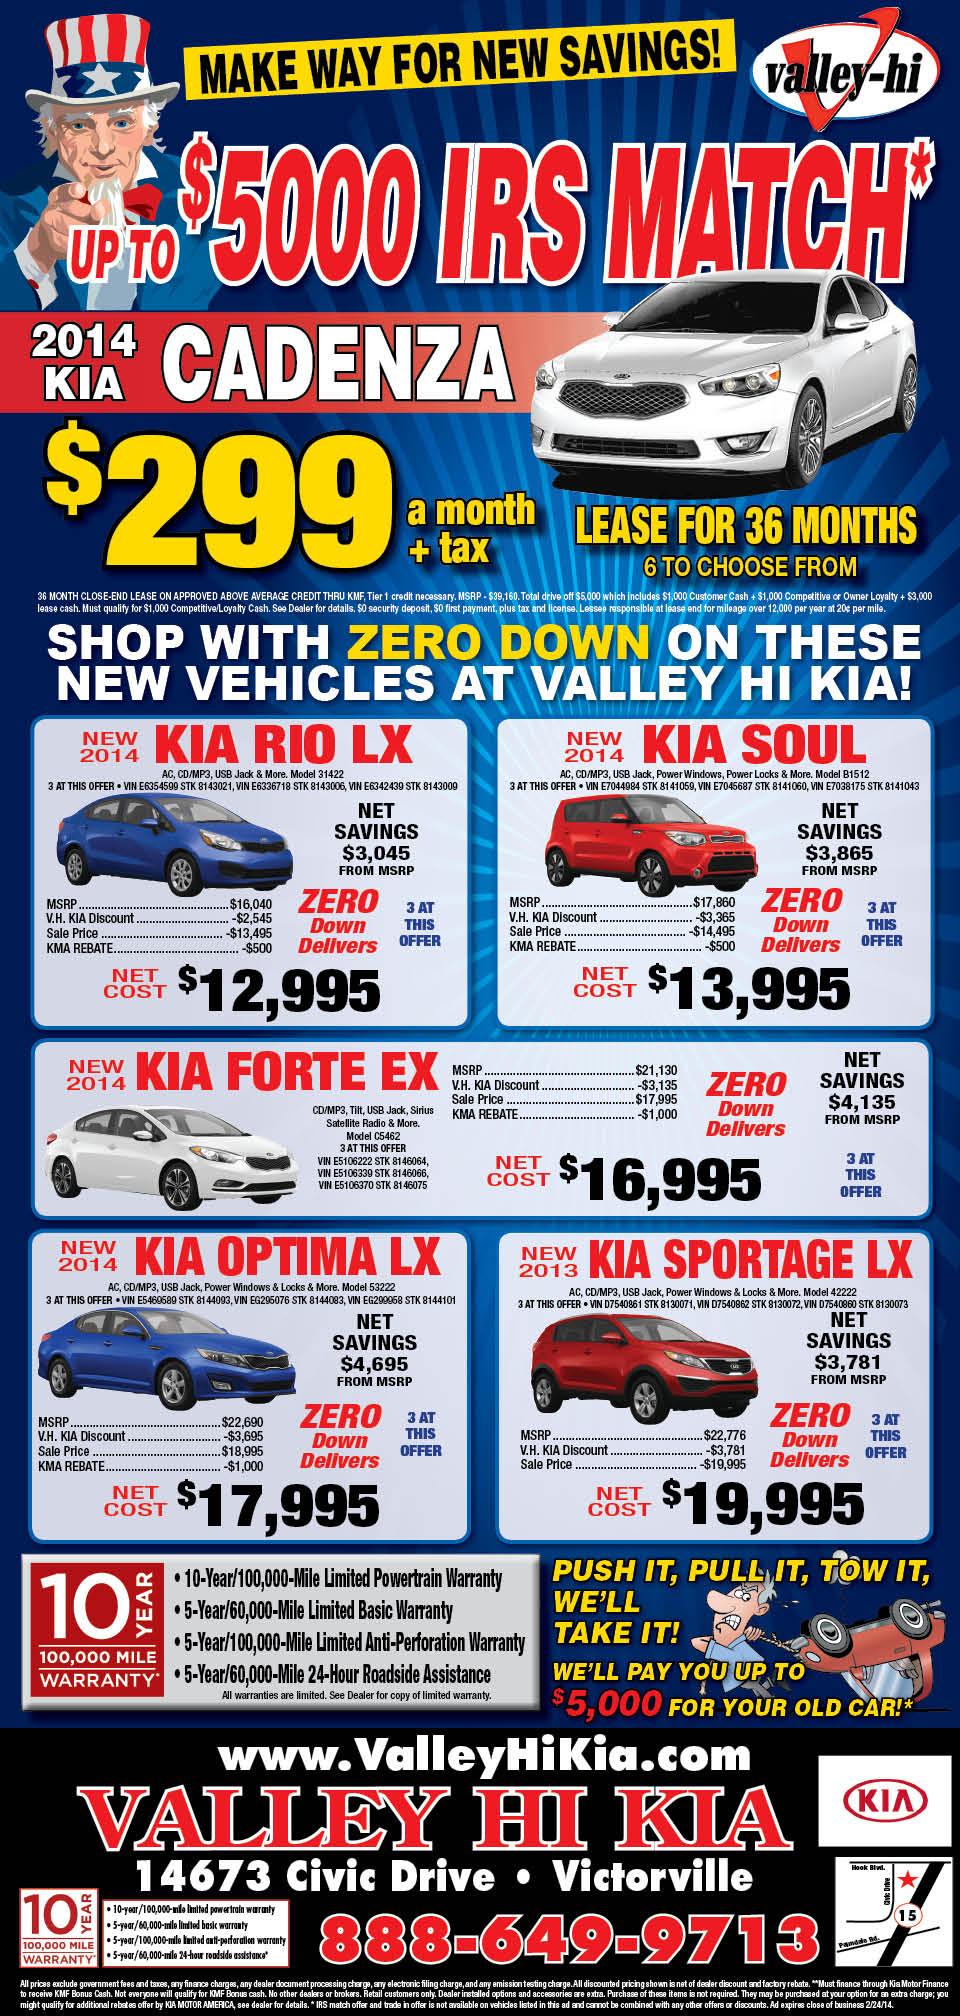 Newspaper Car Ads Gallery